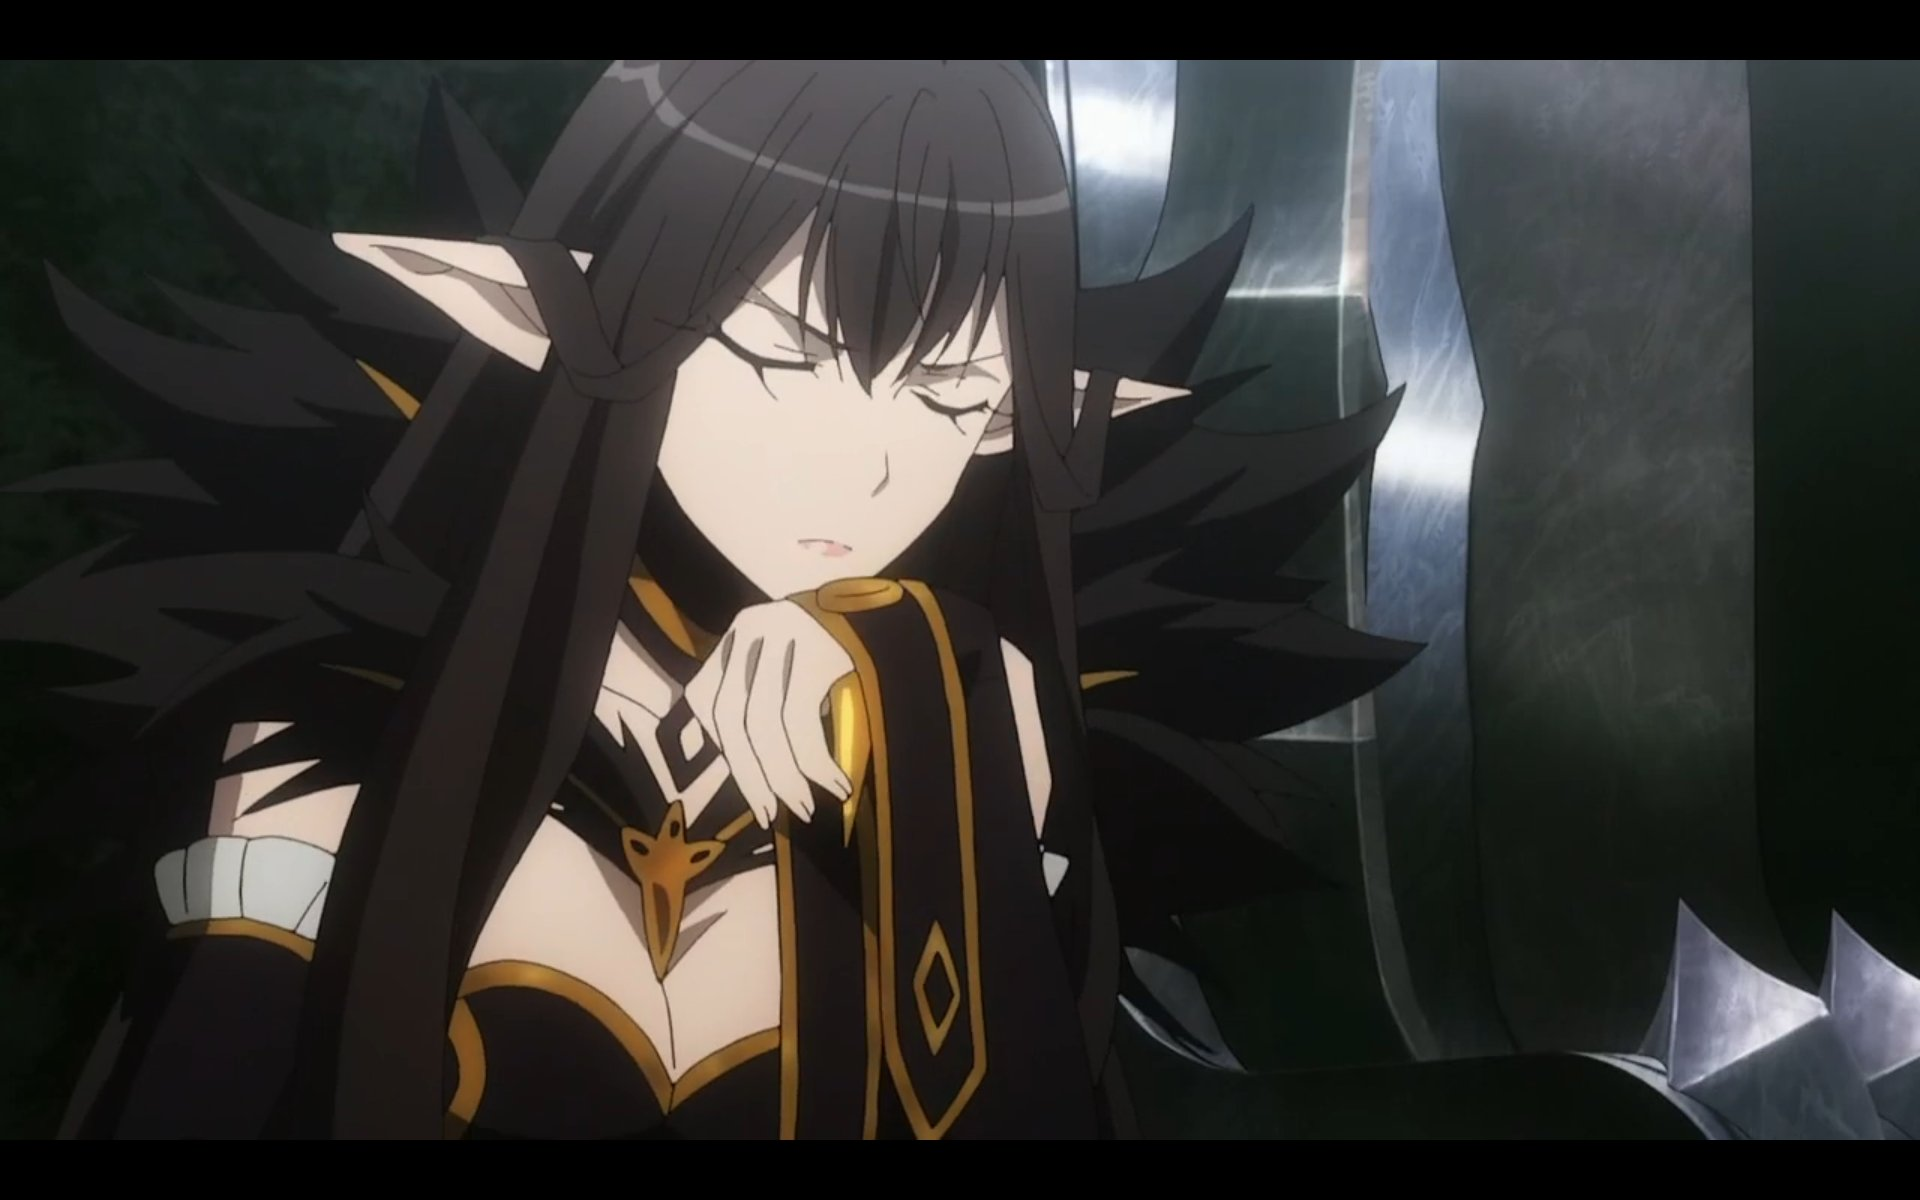 Fate/Apocrypha 第11話 キャプ畫像 : ああ,かつて奪われた大聖杯を巡り,そういうサイト。